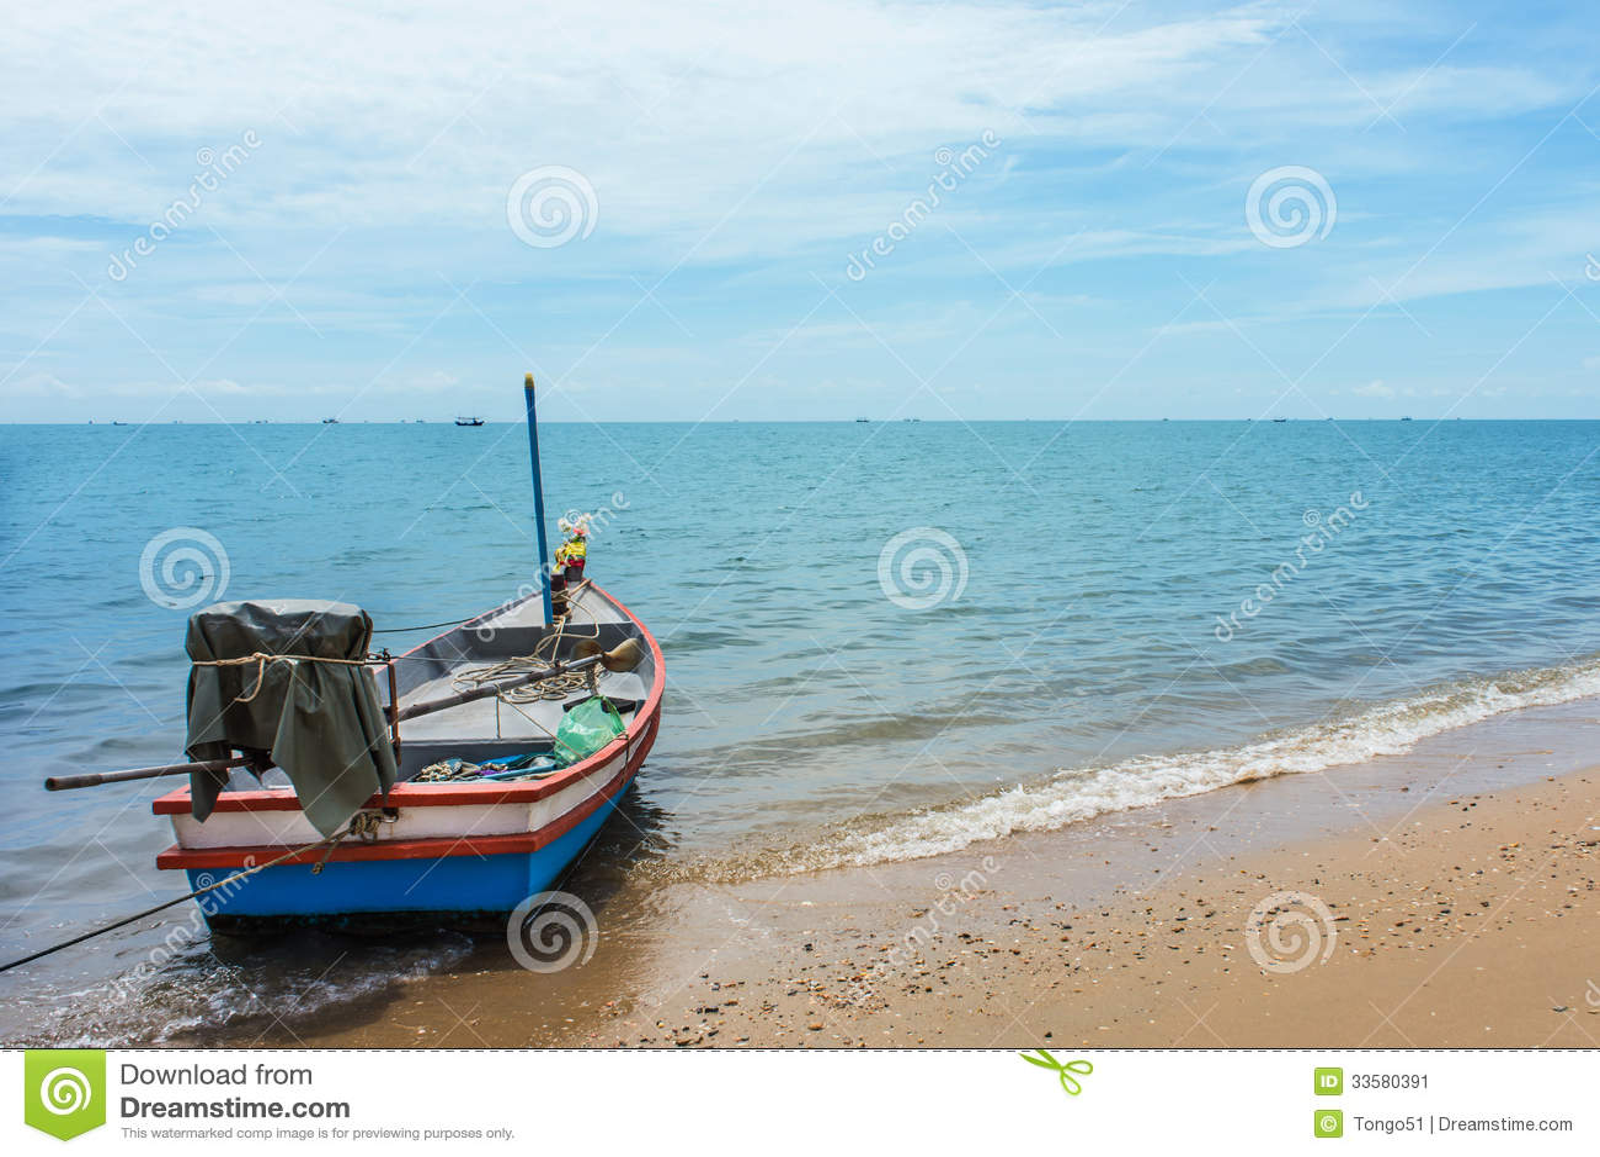 Thailand Sea View Stock Image